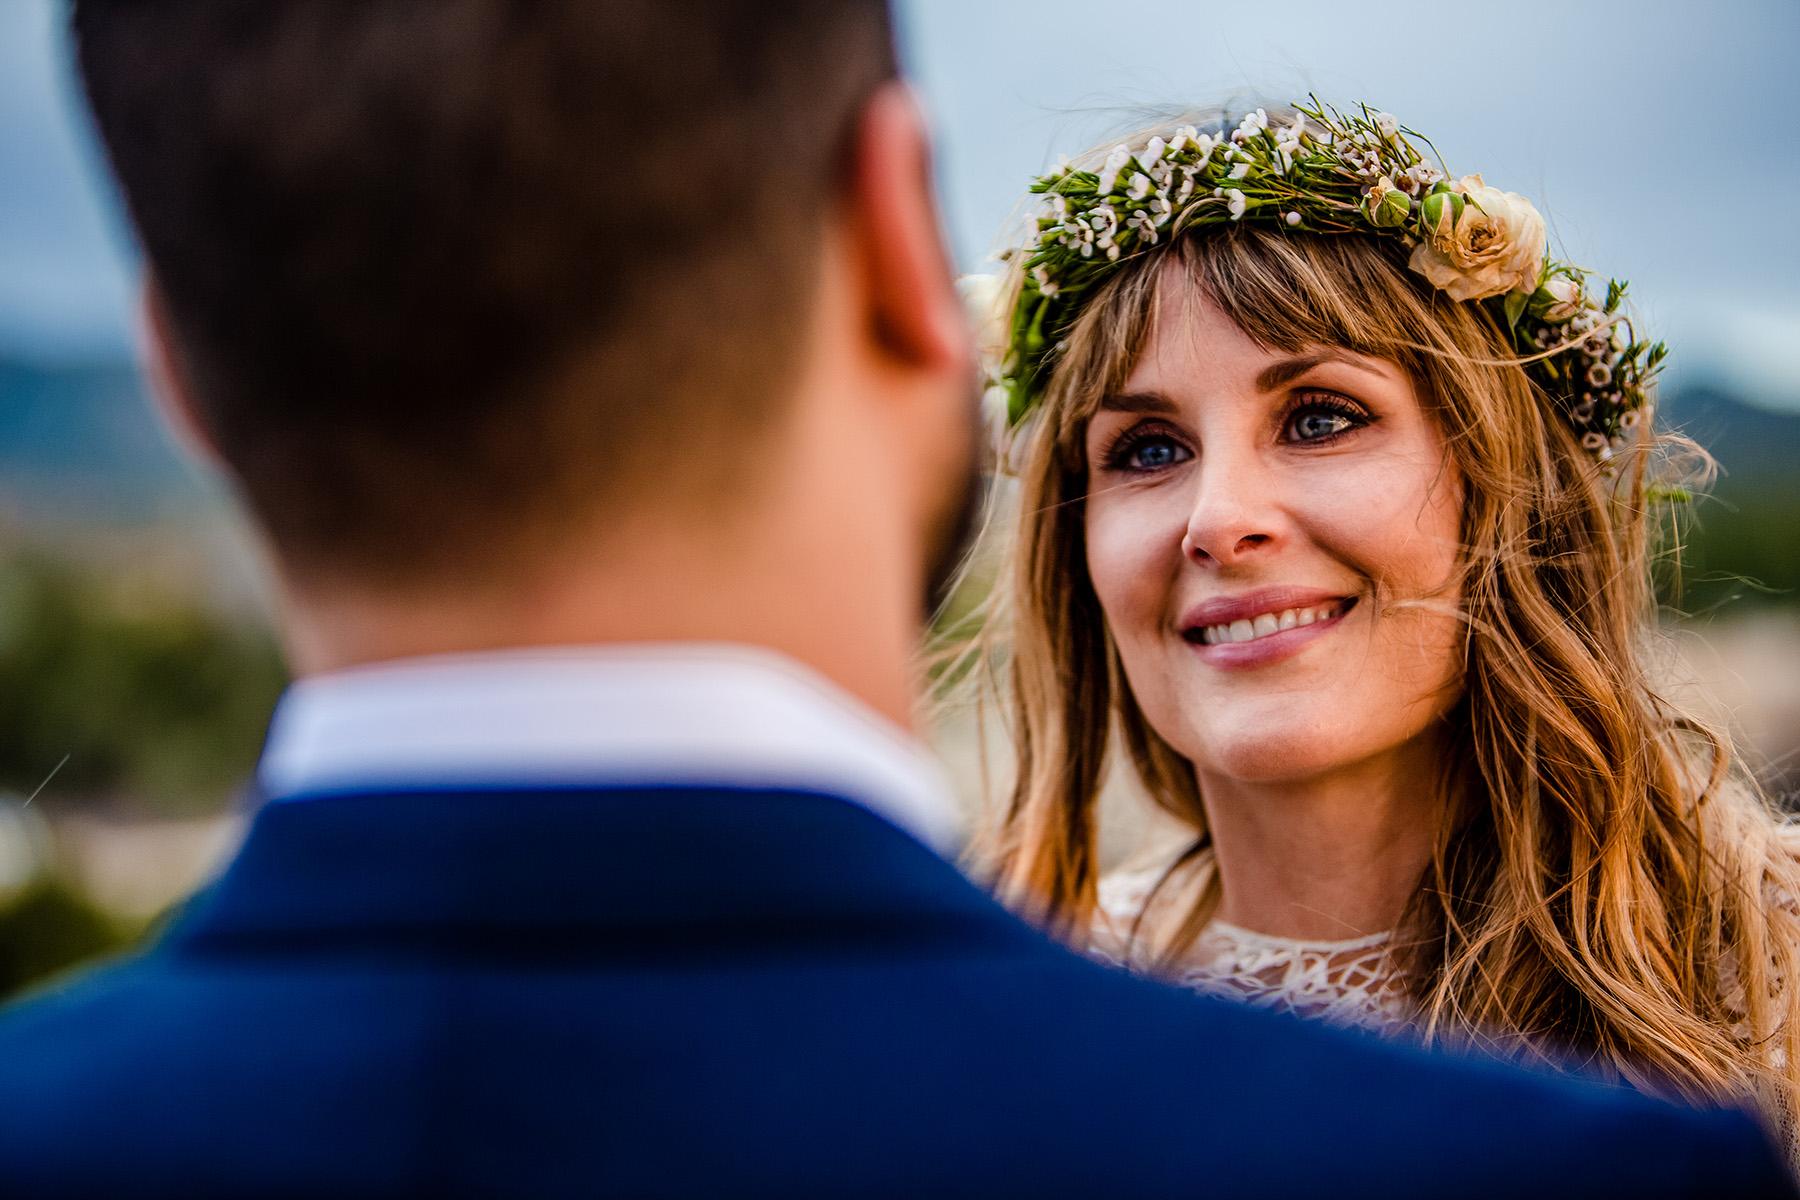 Melinda-Dustin-wedding-four-seasons-resort-santa-fe-new-mexico-1017